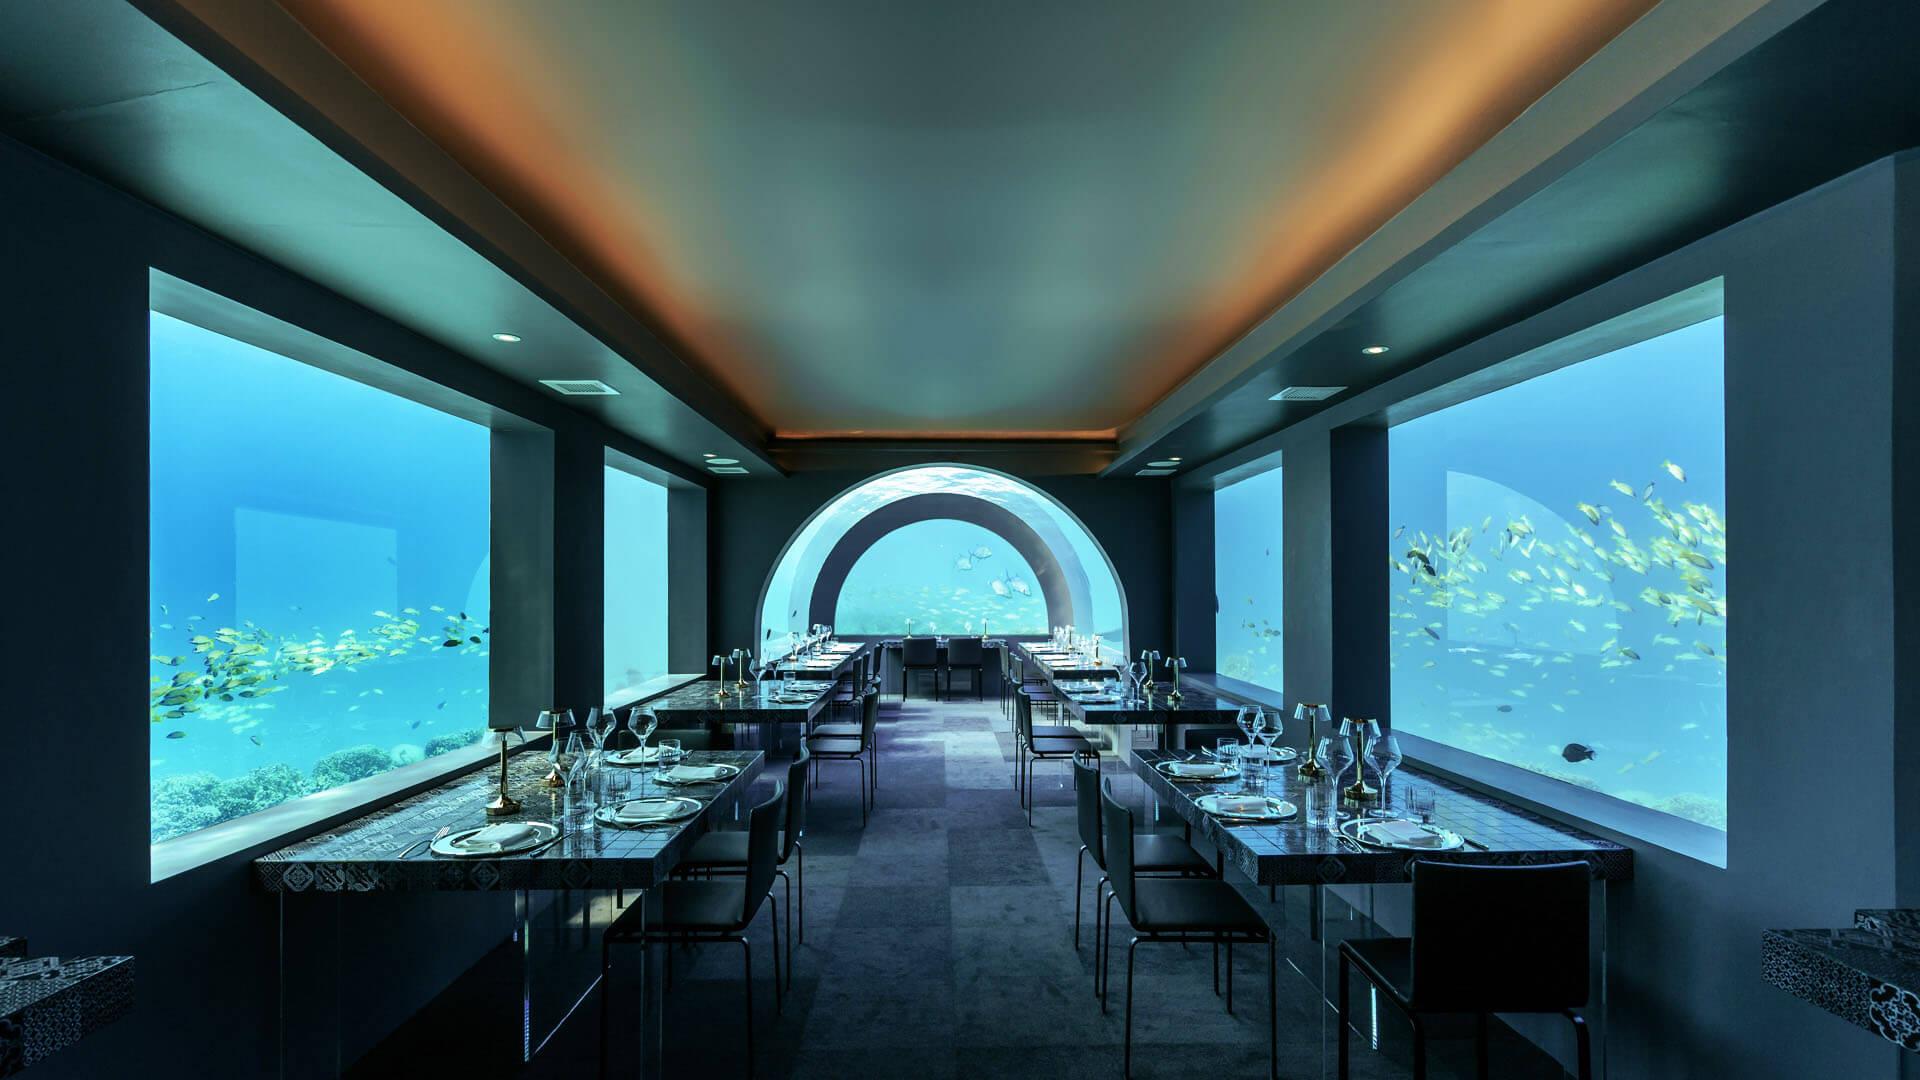 Restaurante H2O by chef Andrea Berton